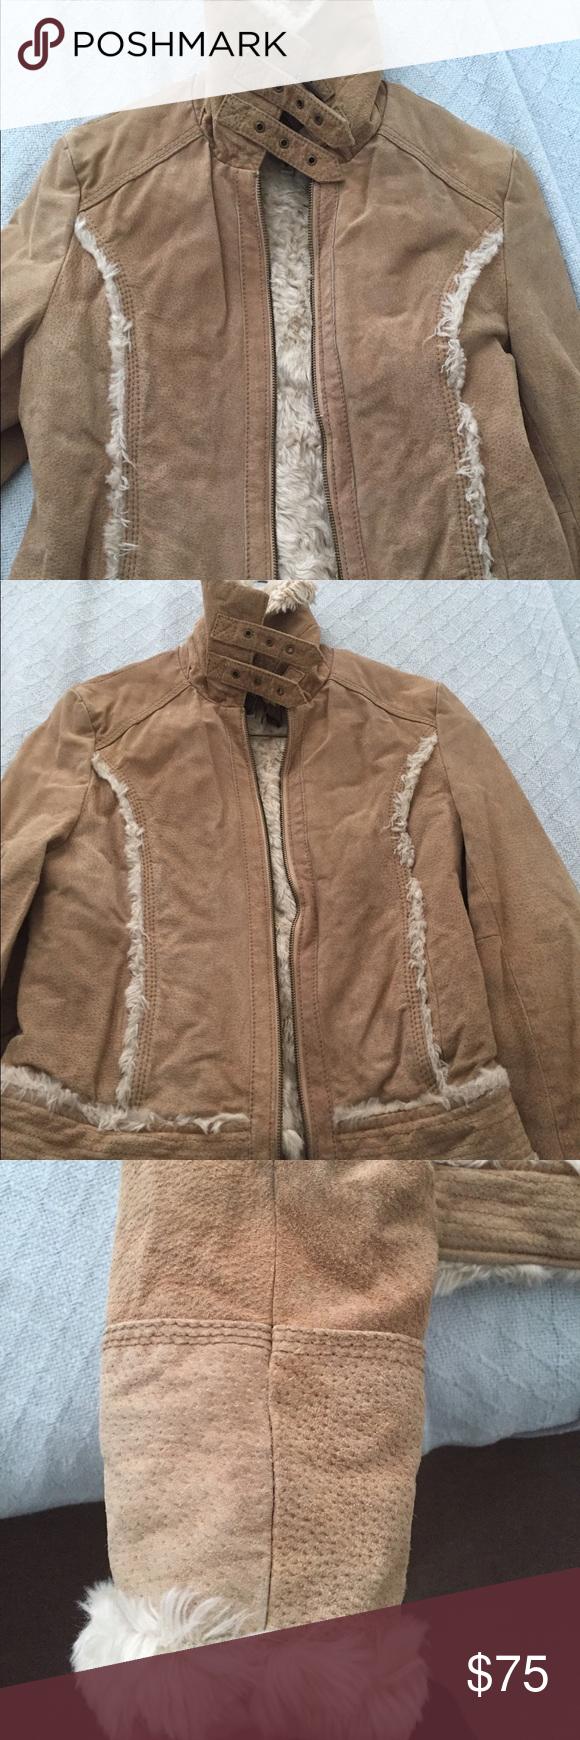 Suede fringe jacket Genuine suede vintage jacket from